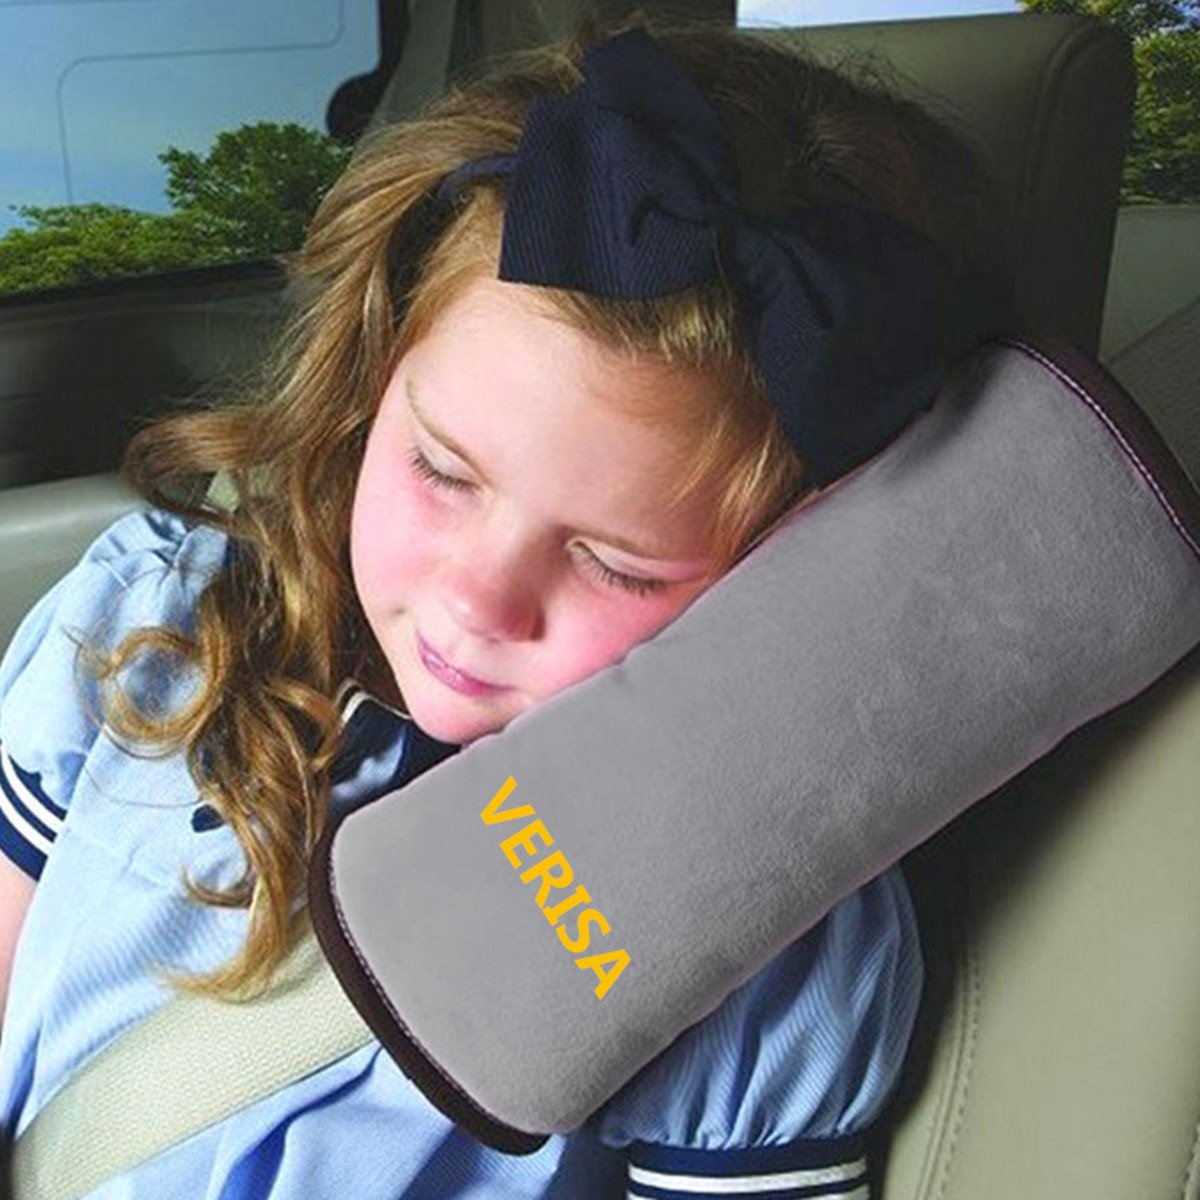 VERISA Seat Belt Pillow, Car Seat Belt Covers for Kids, Adjust Vehicle Shoulder Pads, Safety Belt Protector Cushion, Plush Soft Auto Seat Belt Strap Cover Headrest Neck Support for Children Kid Adult